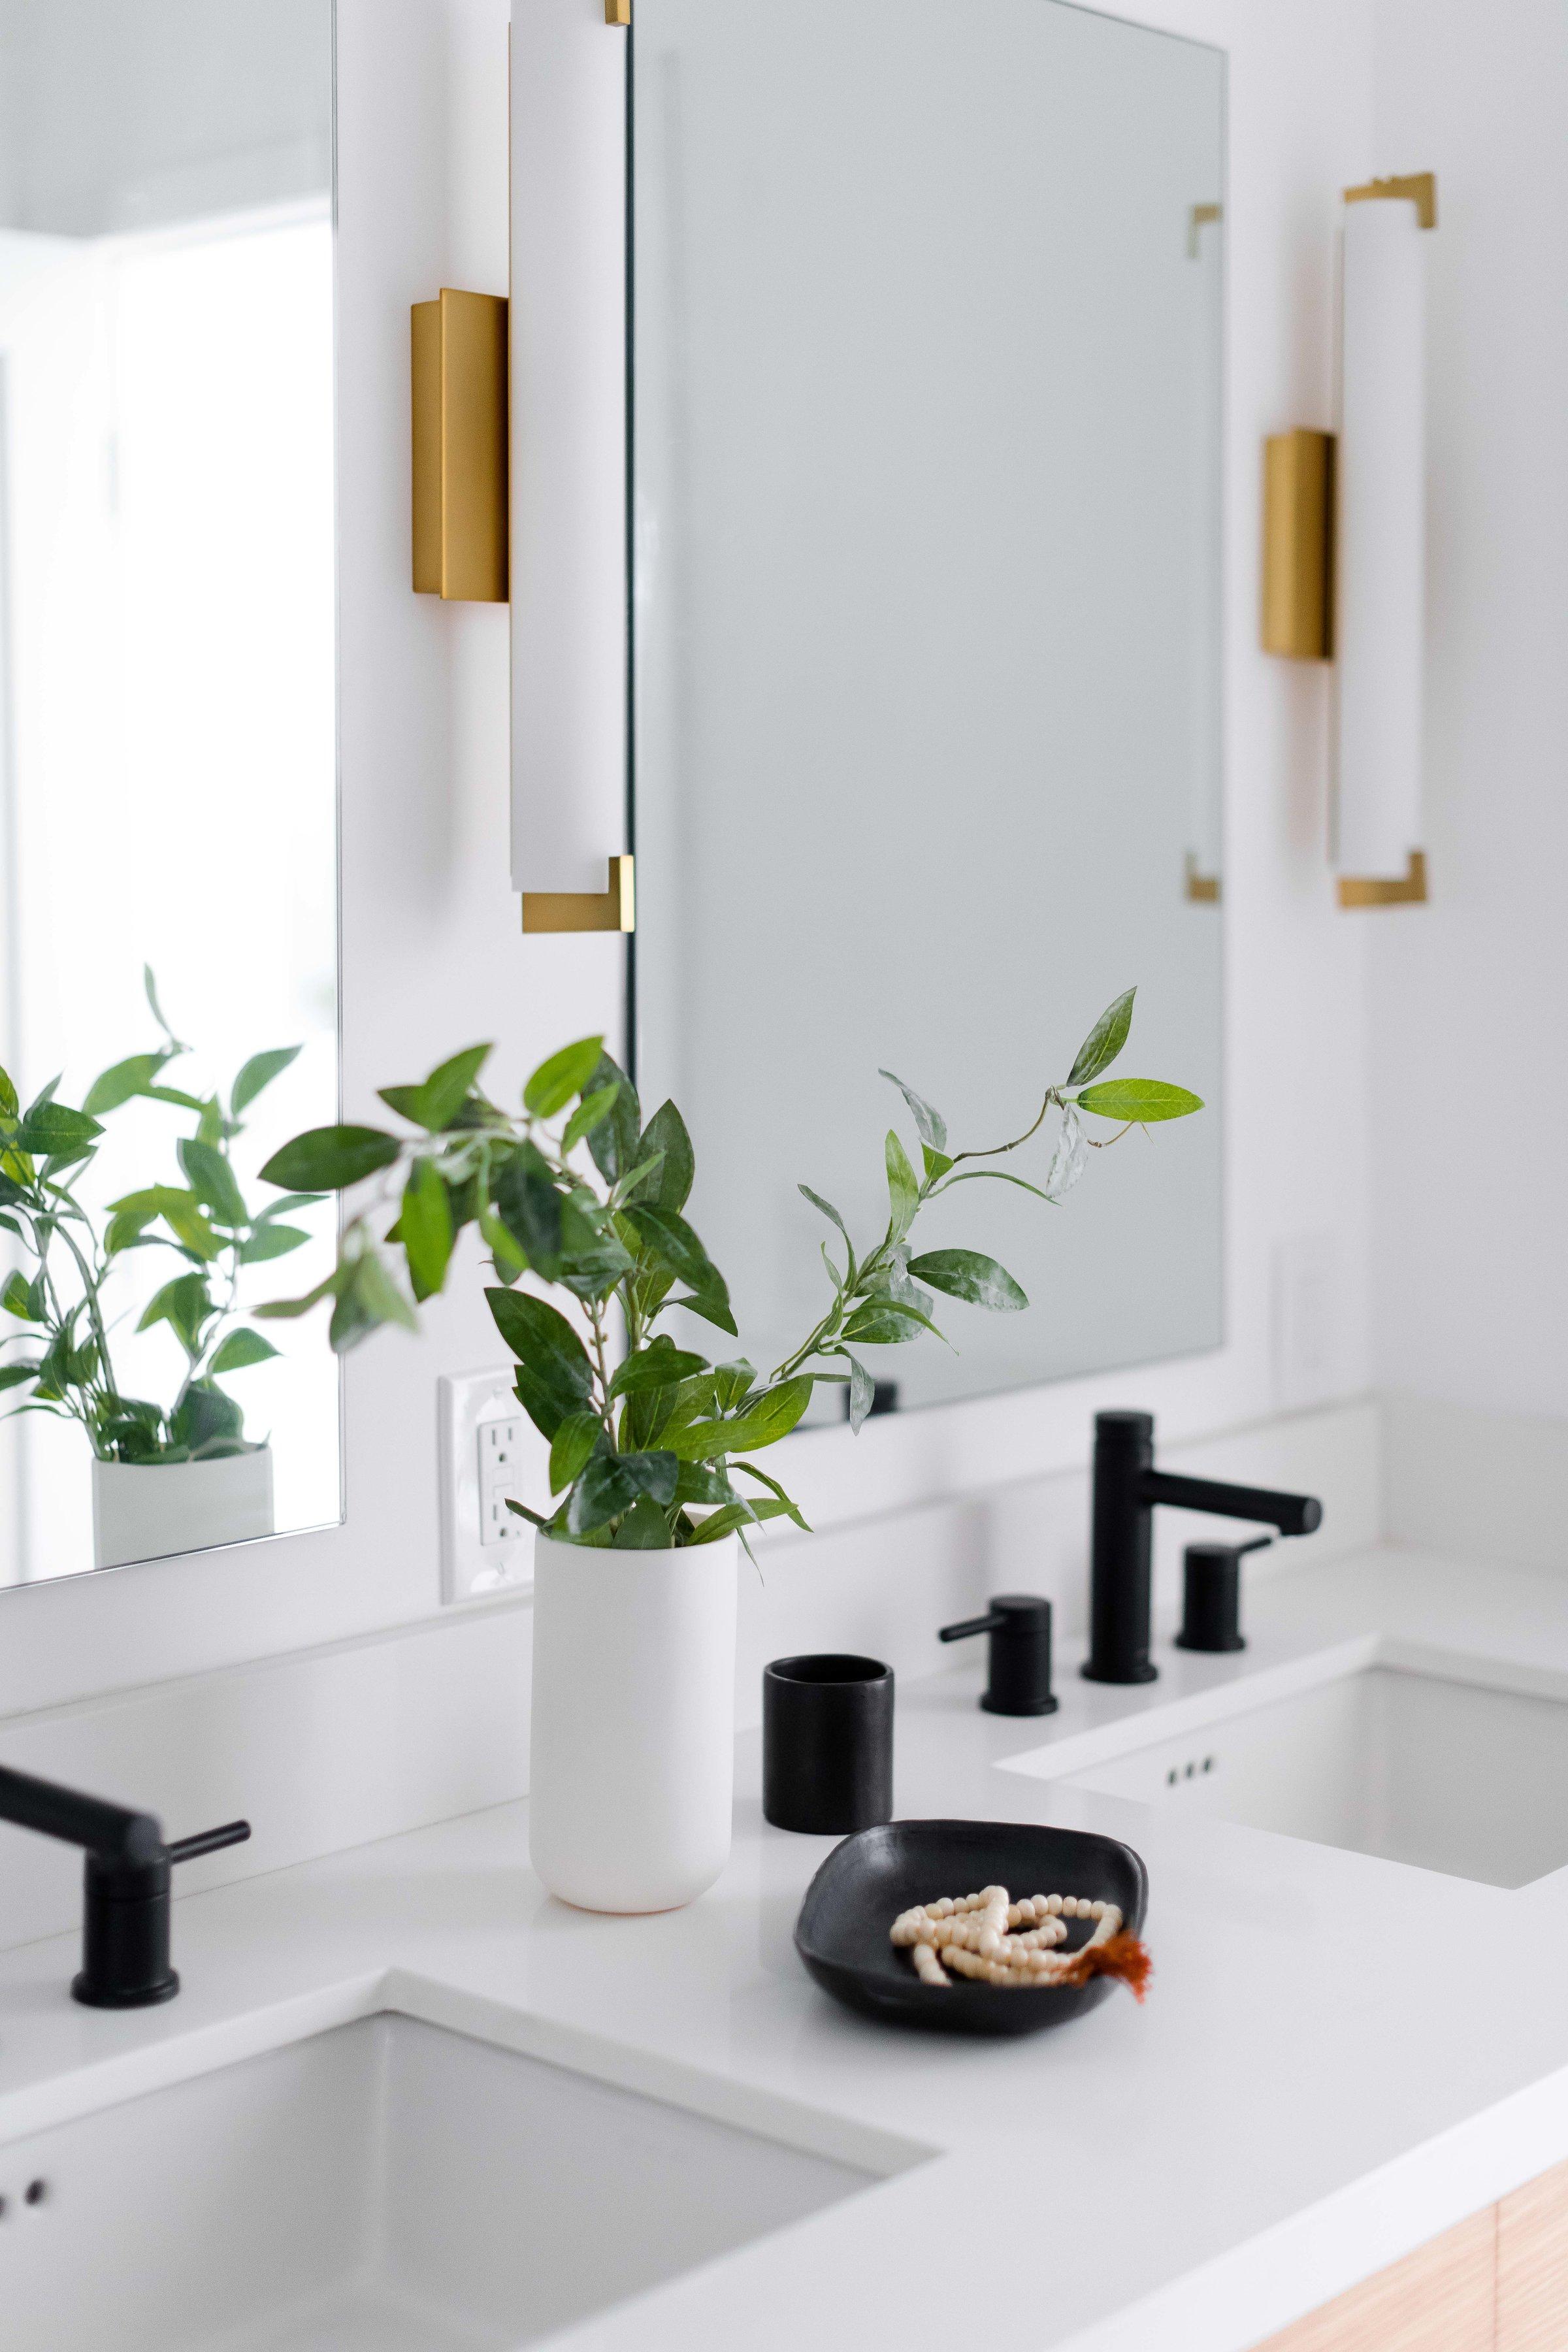 brass bathroom sconces - the habitat collective interior design - #projectpeachy